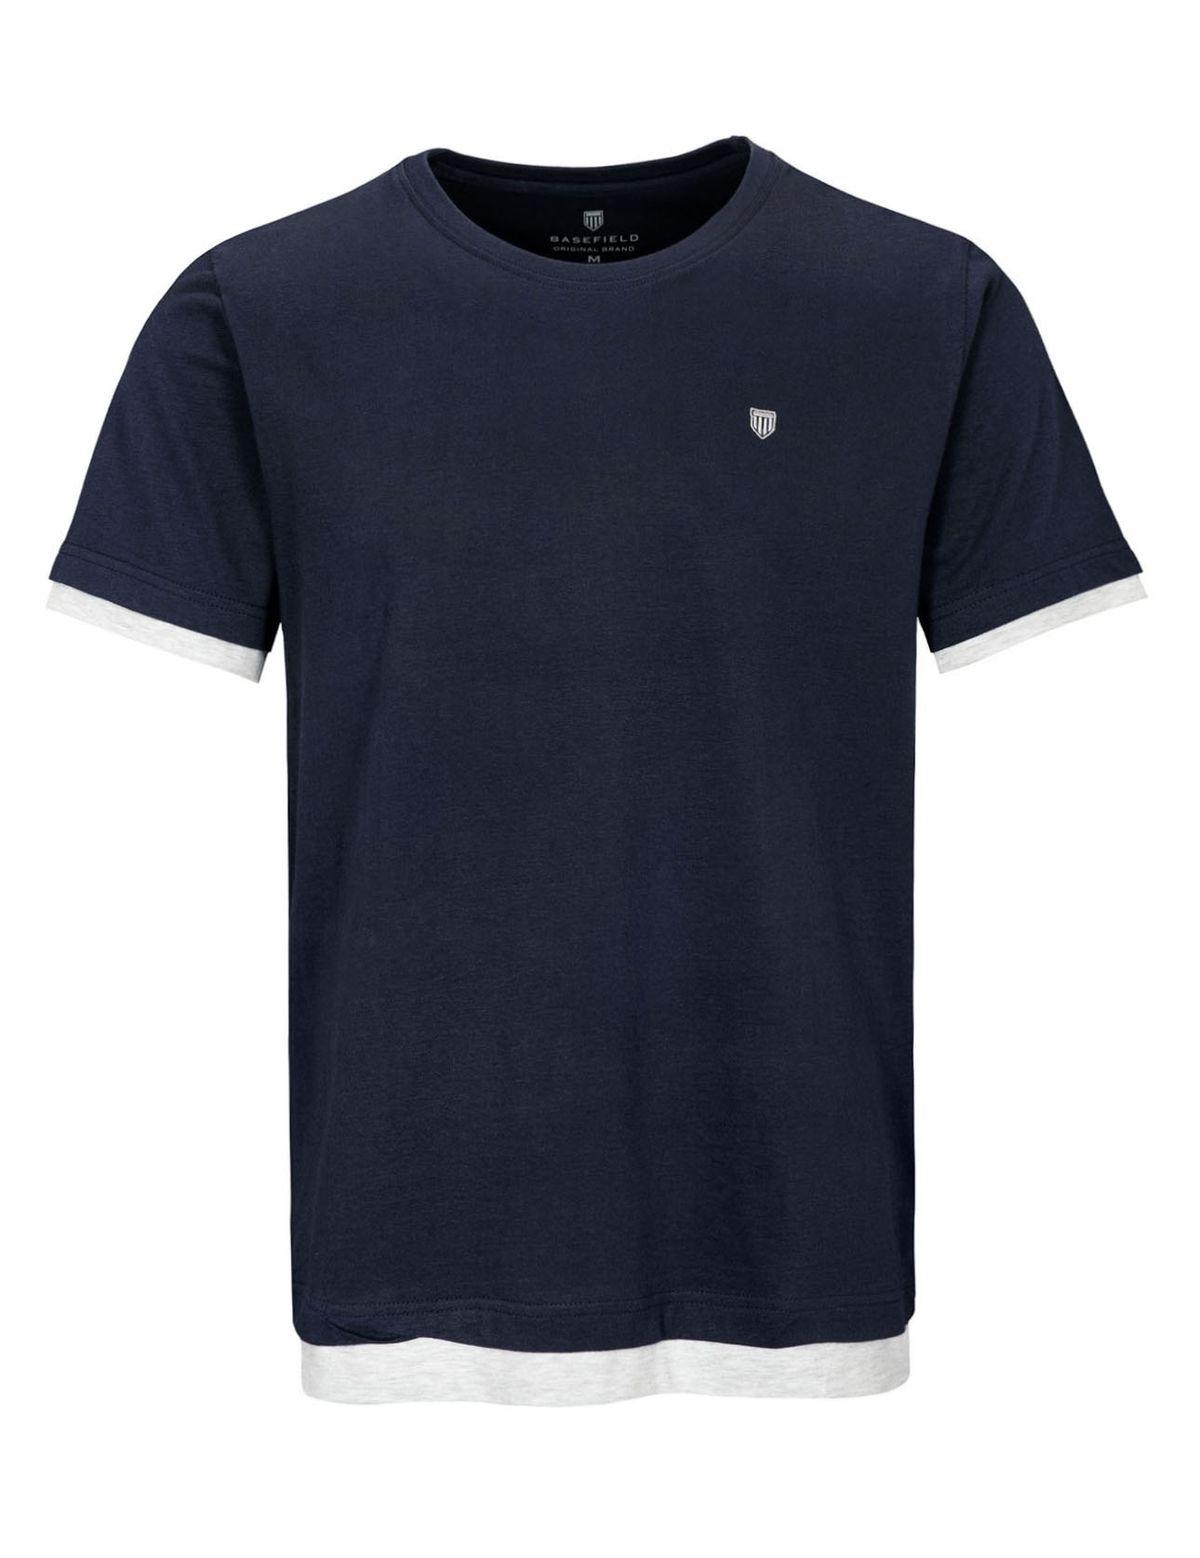 HOMEWEAR Pyjama Shirt in Layer-Optik - Navy